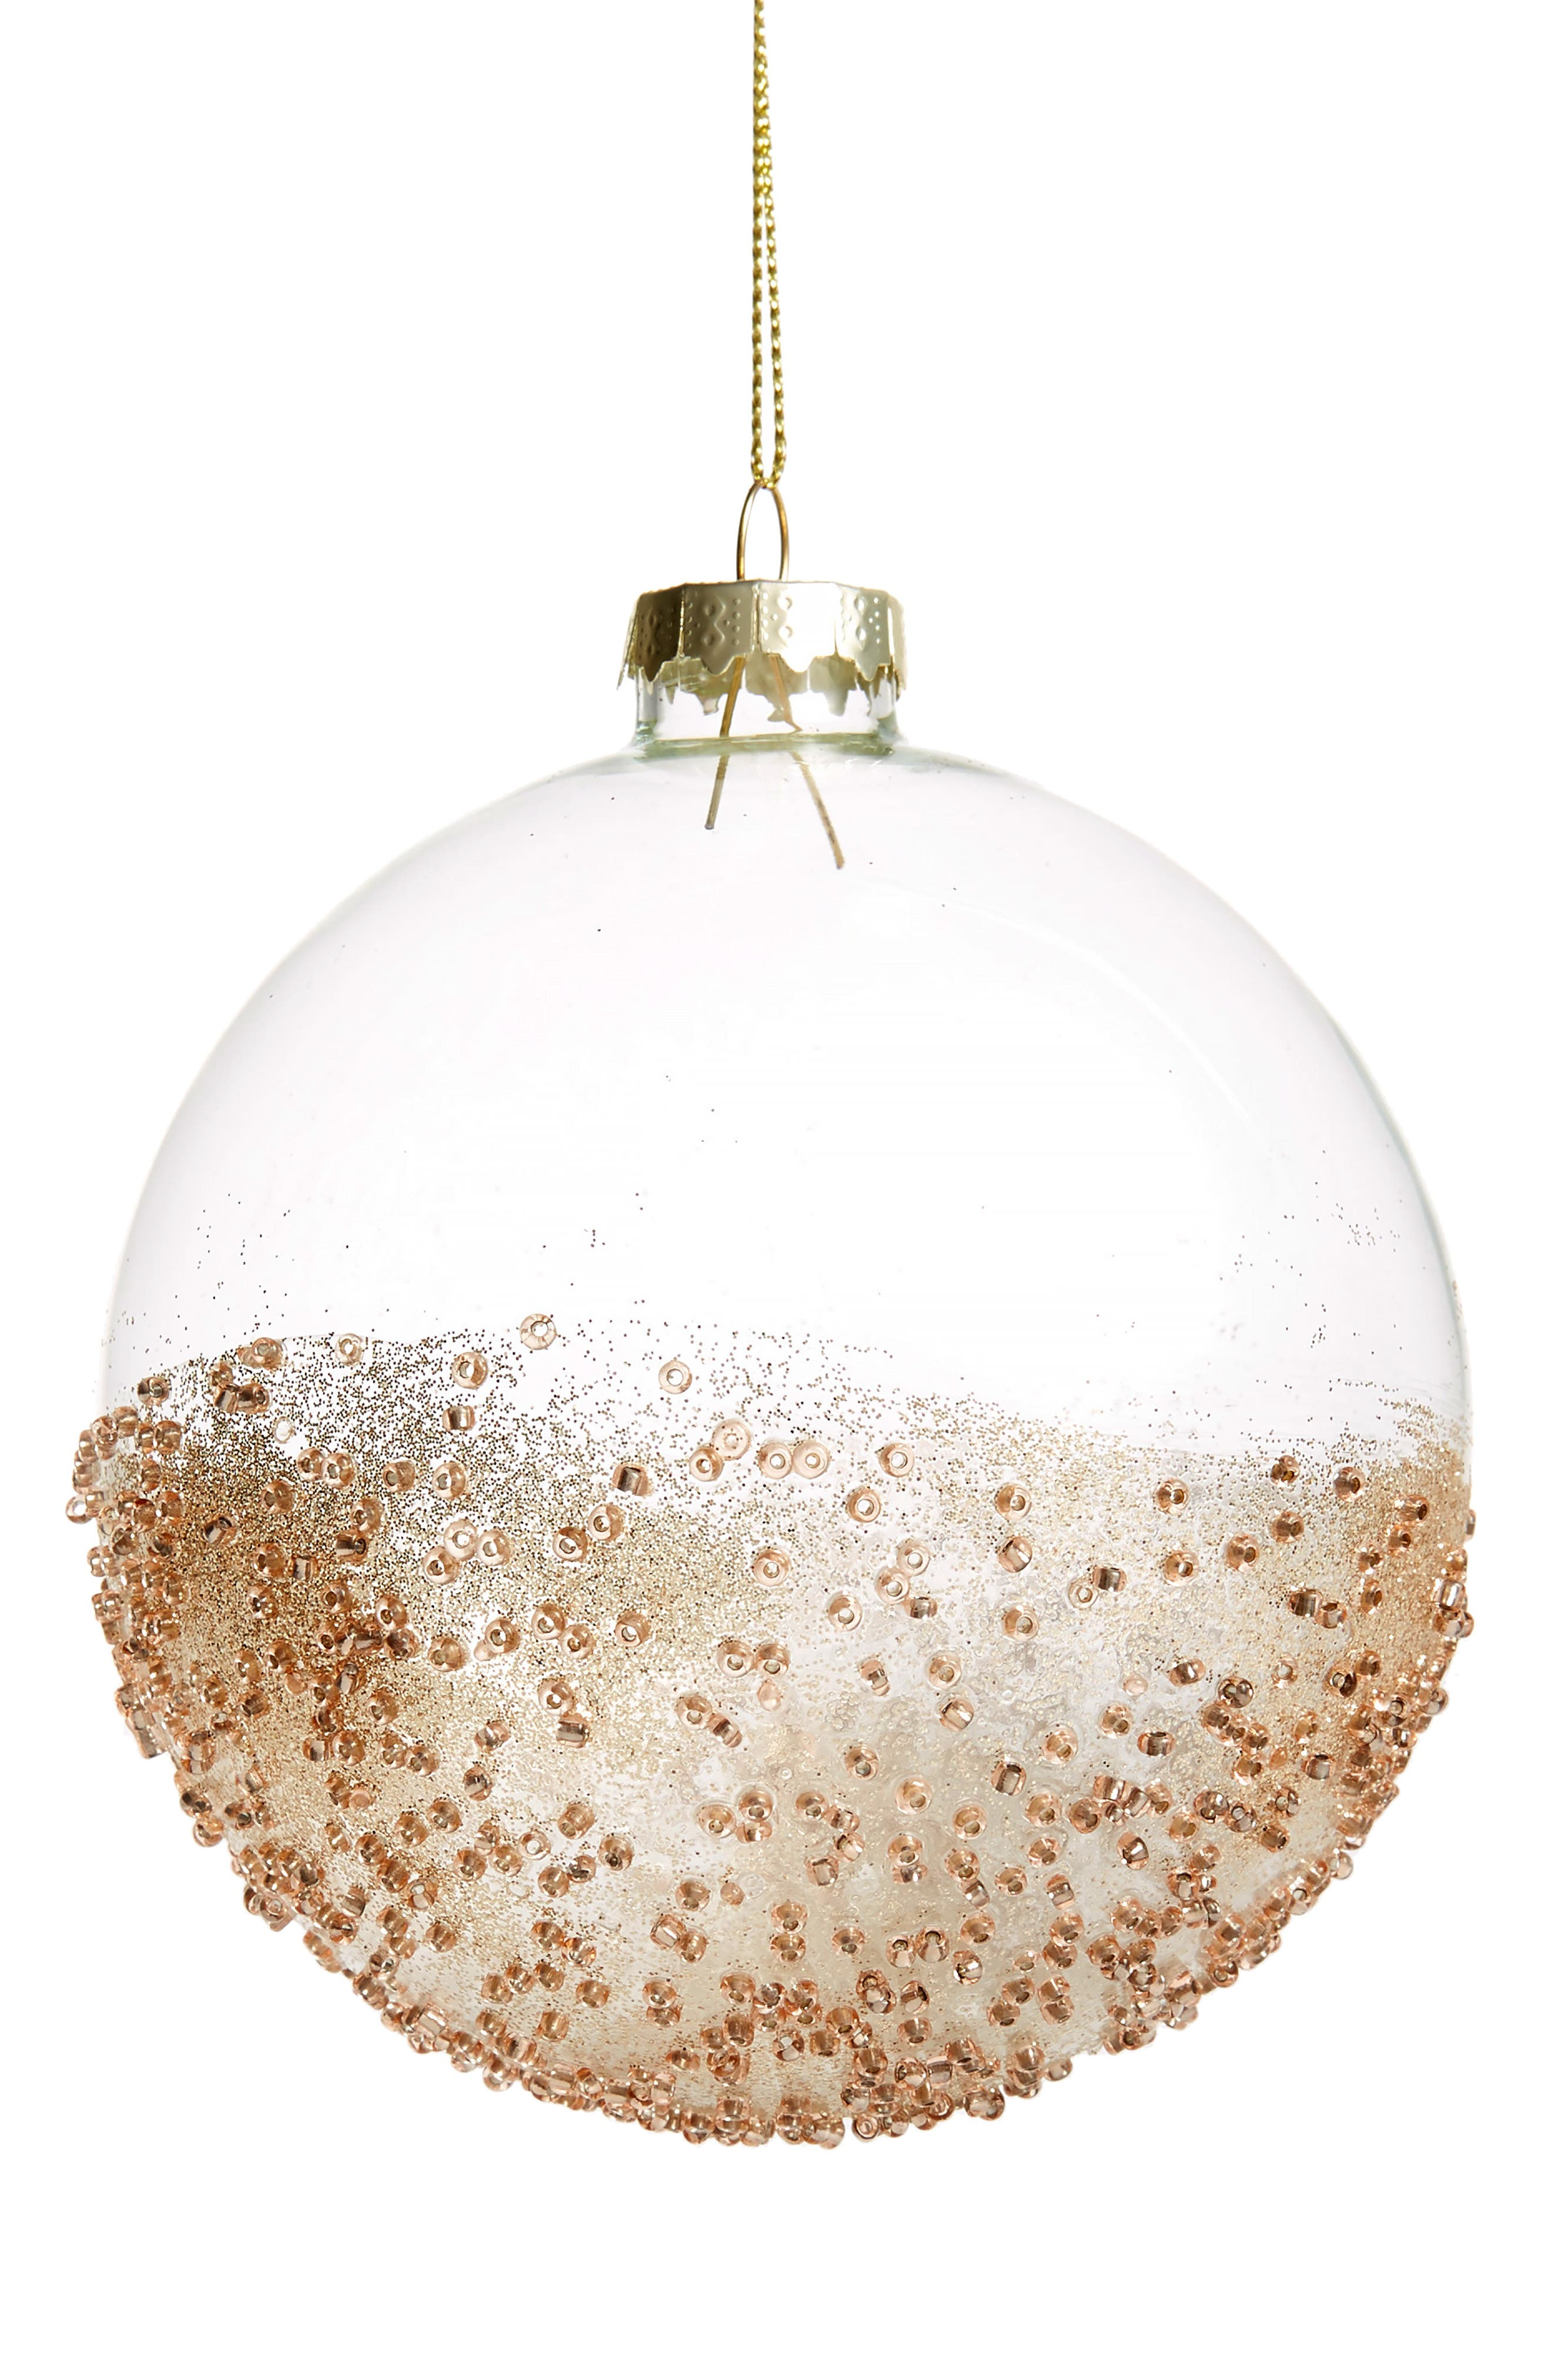 Glitter Glass Ball Ornament,                             Main thumbnail 1, color,                             COPPER